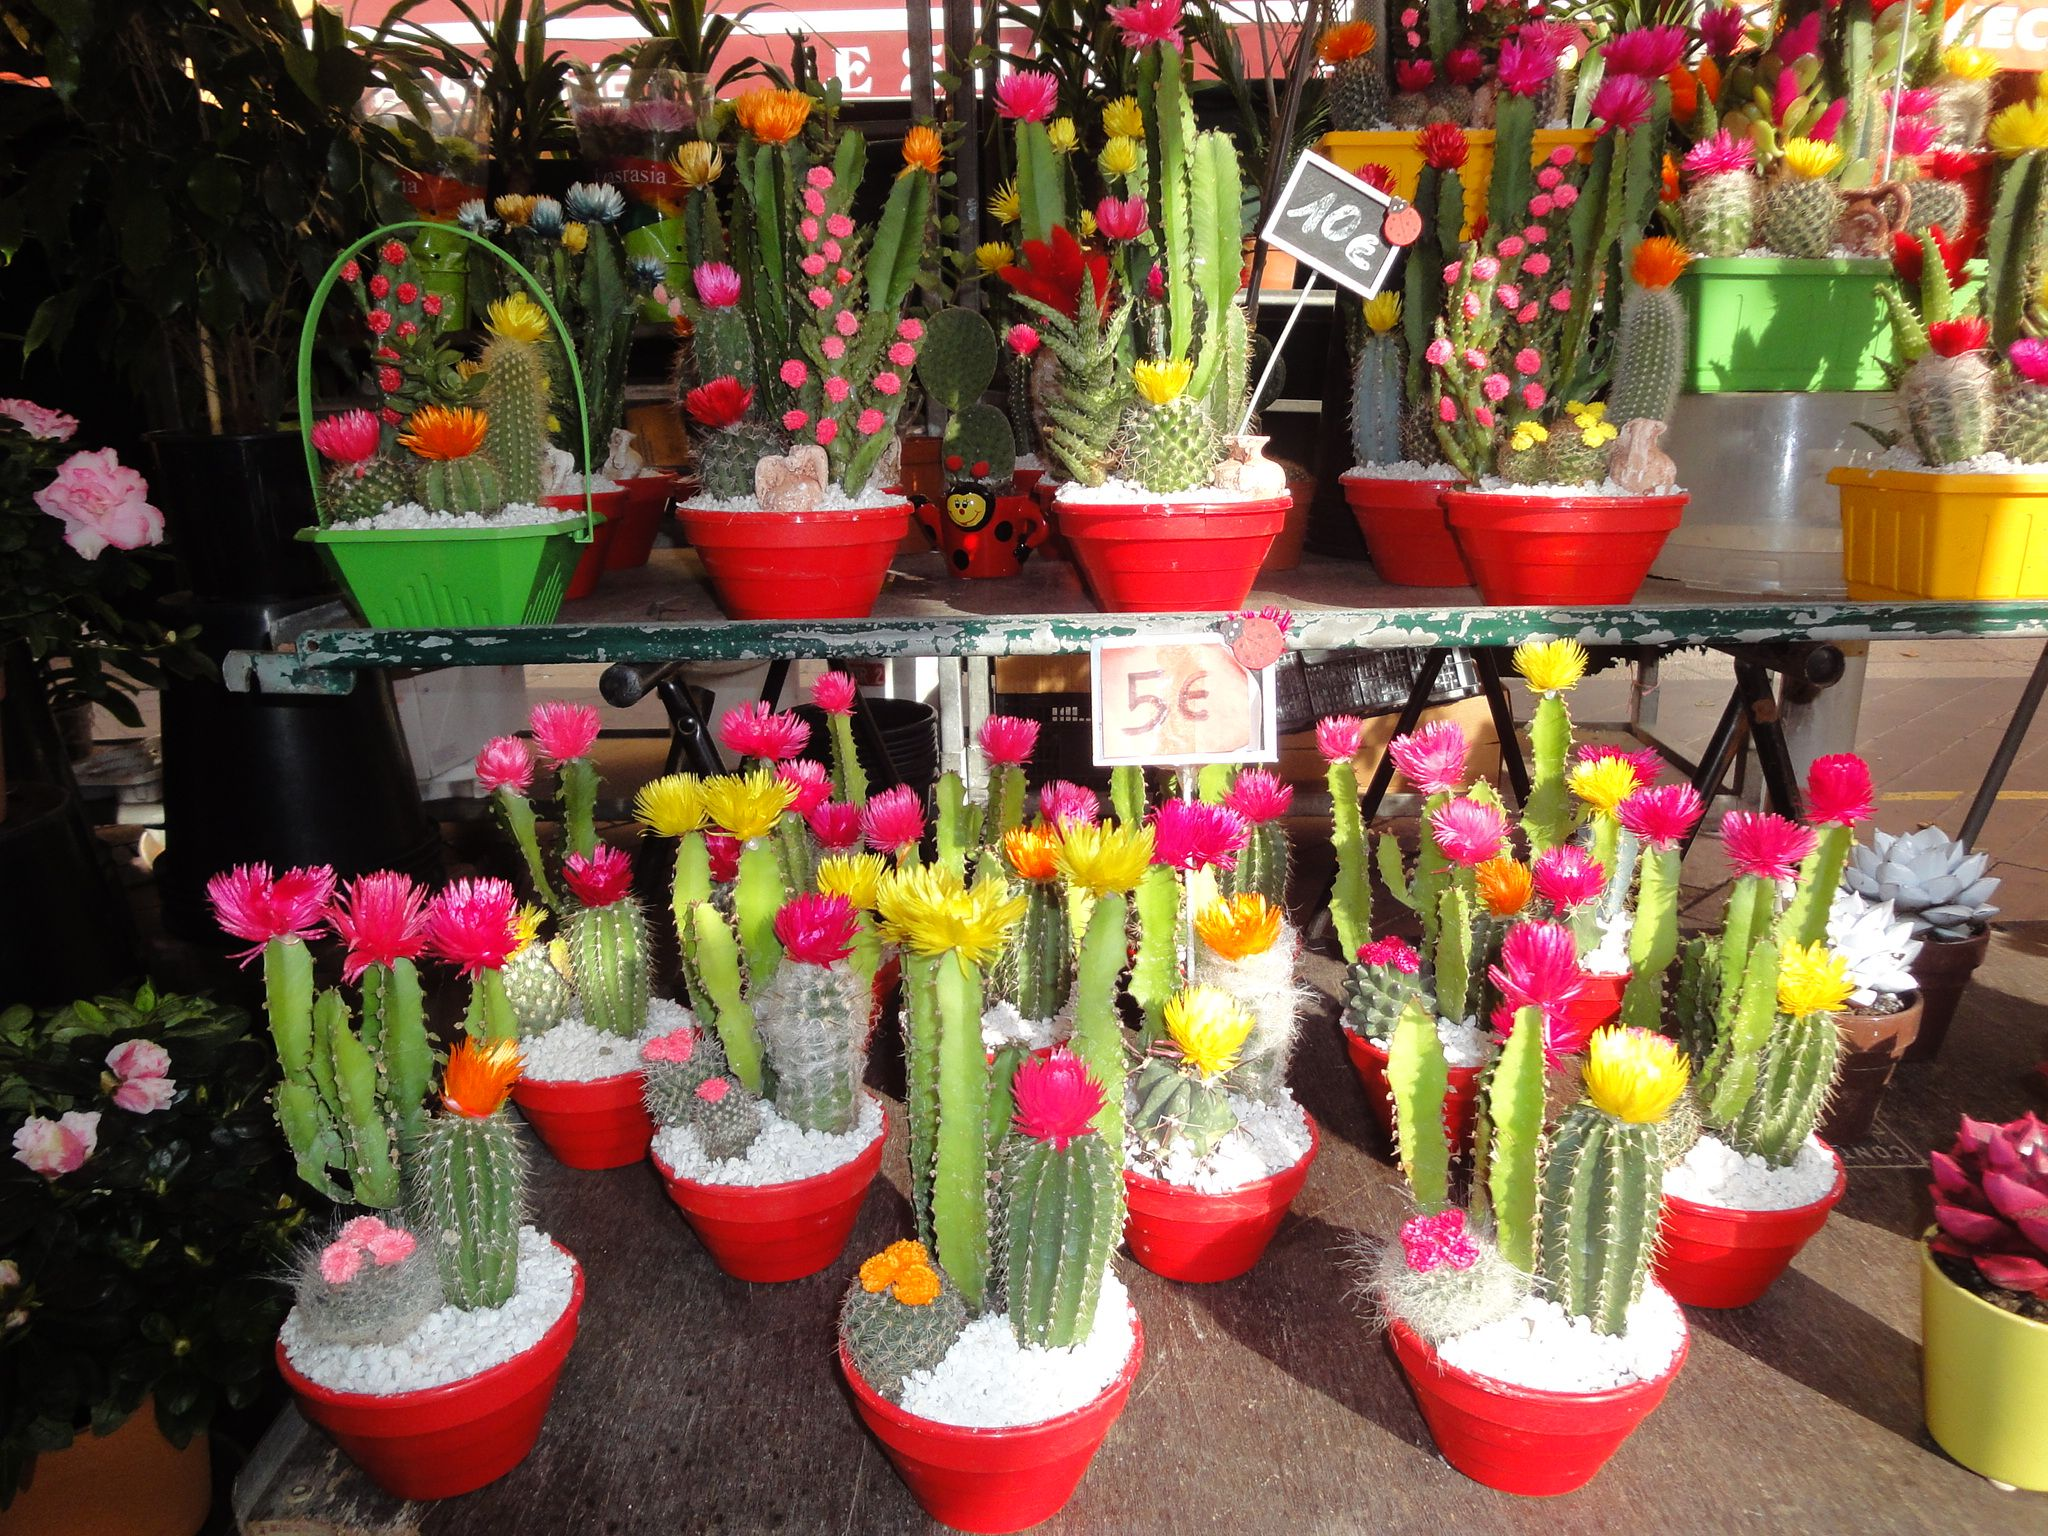 More flowers in Nice flower market